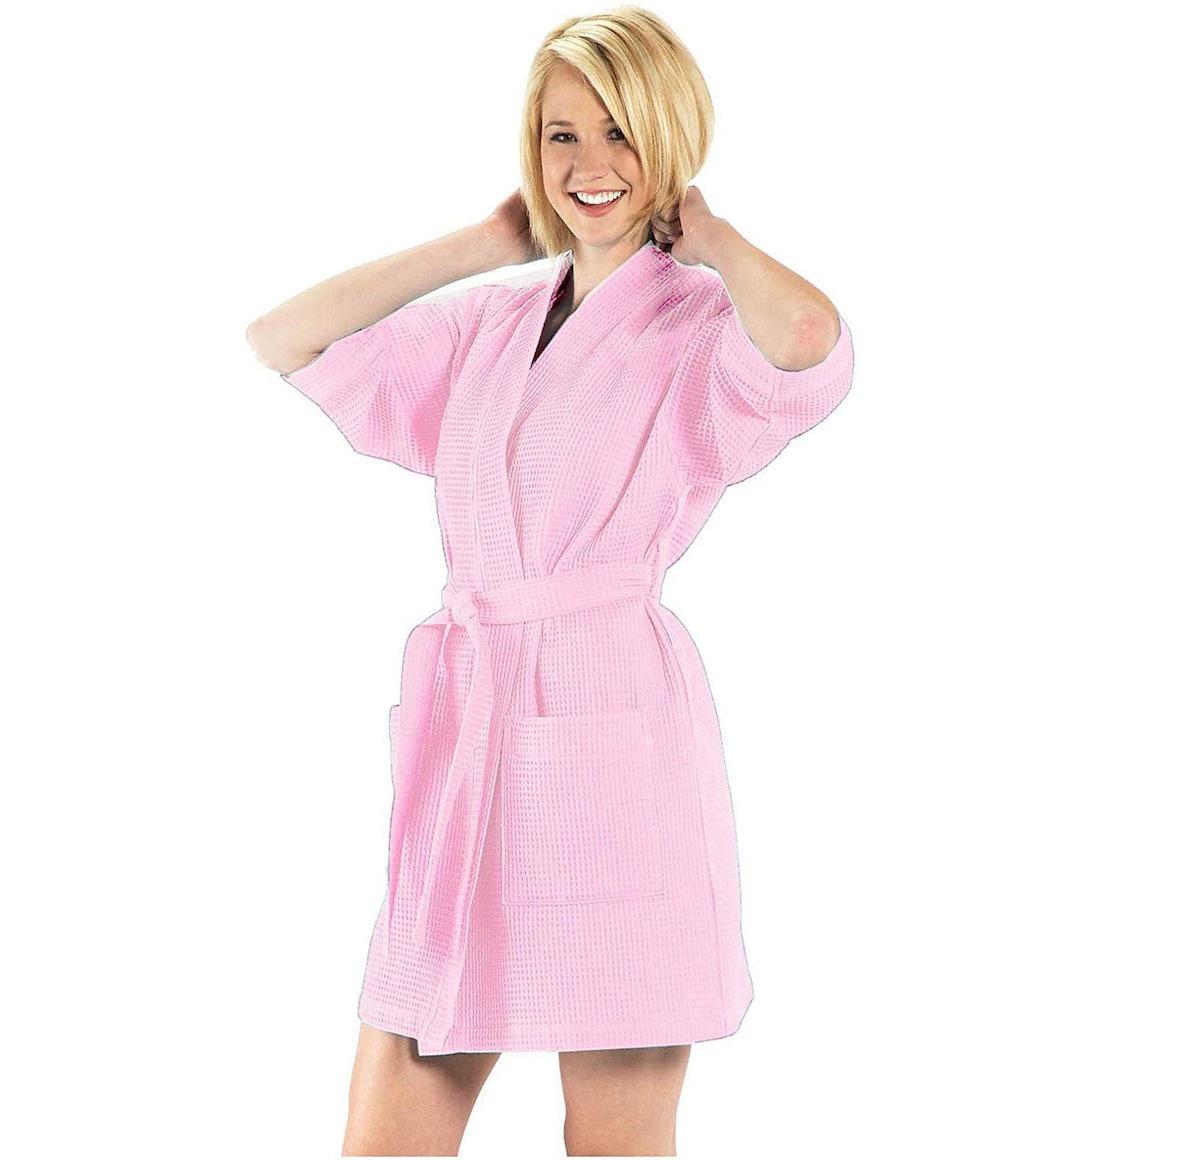 BY LORA Thigh Length Waffle Short Robe